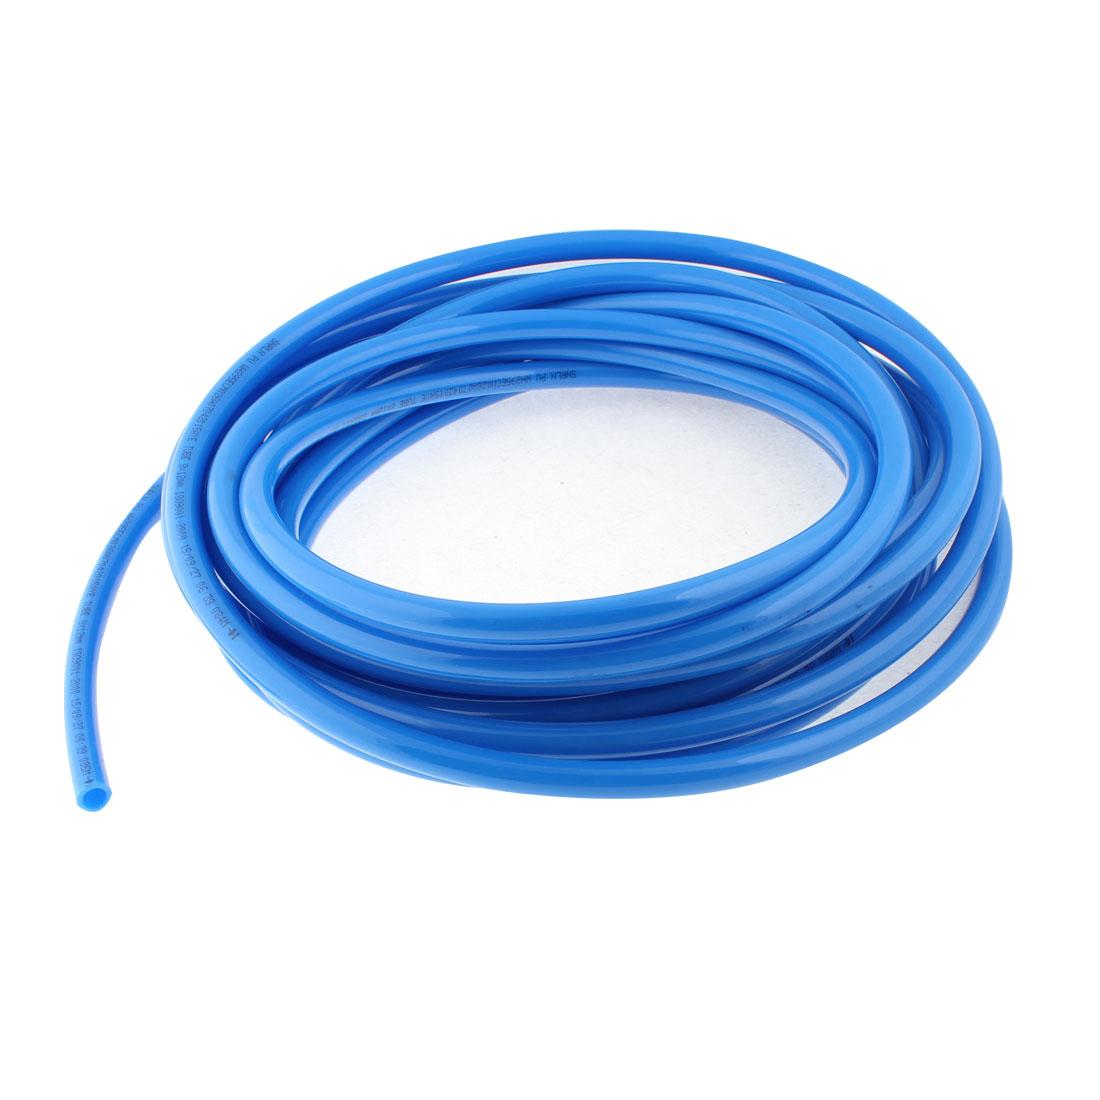 10M 33Ft Length 12mmx8mm Blue Air Compressor Pneumatic Hose Polyurethane PU Pipe Tube Tubing